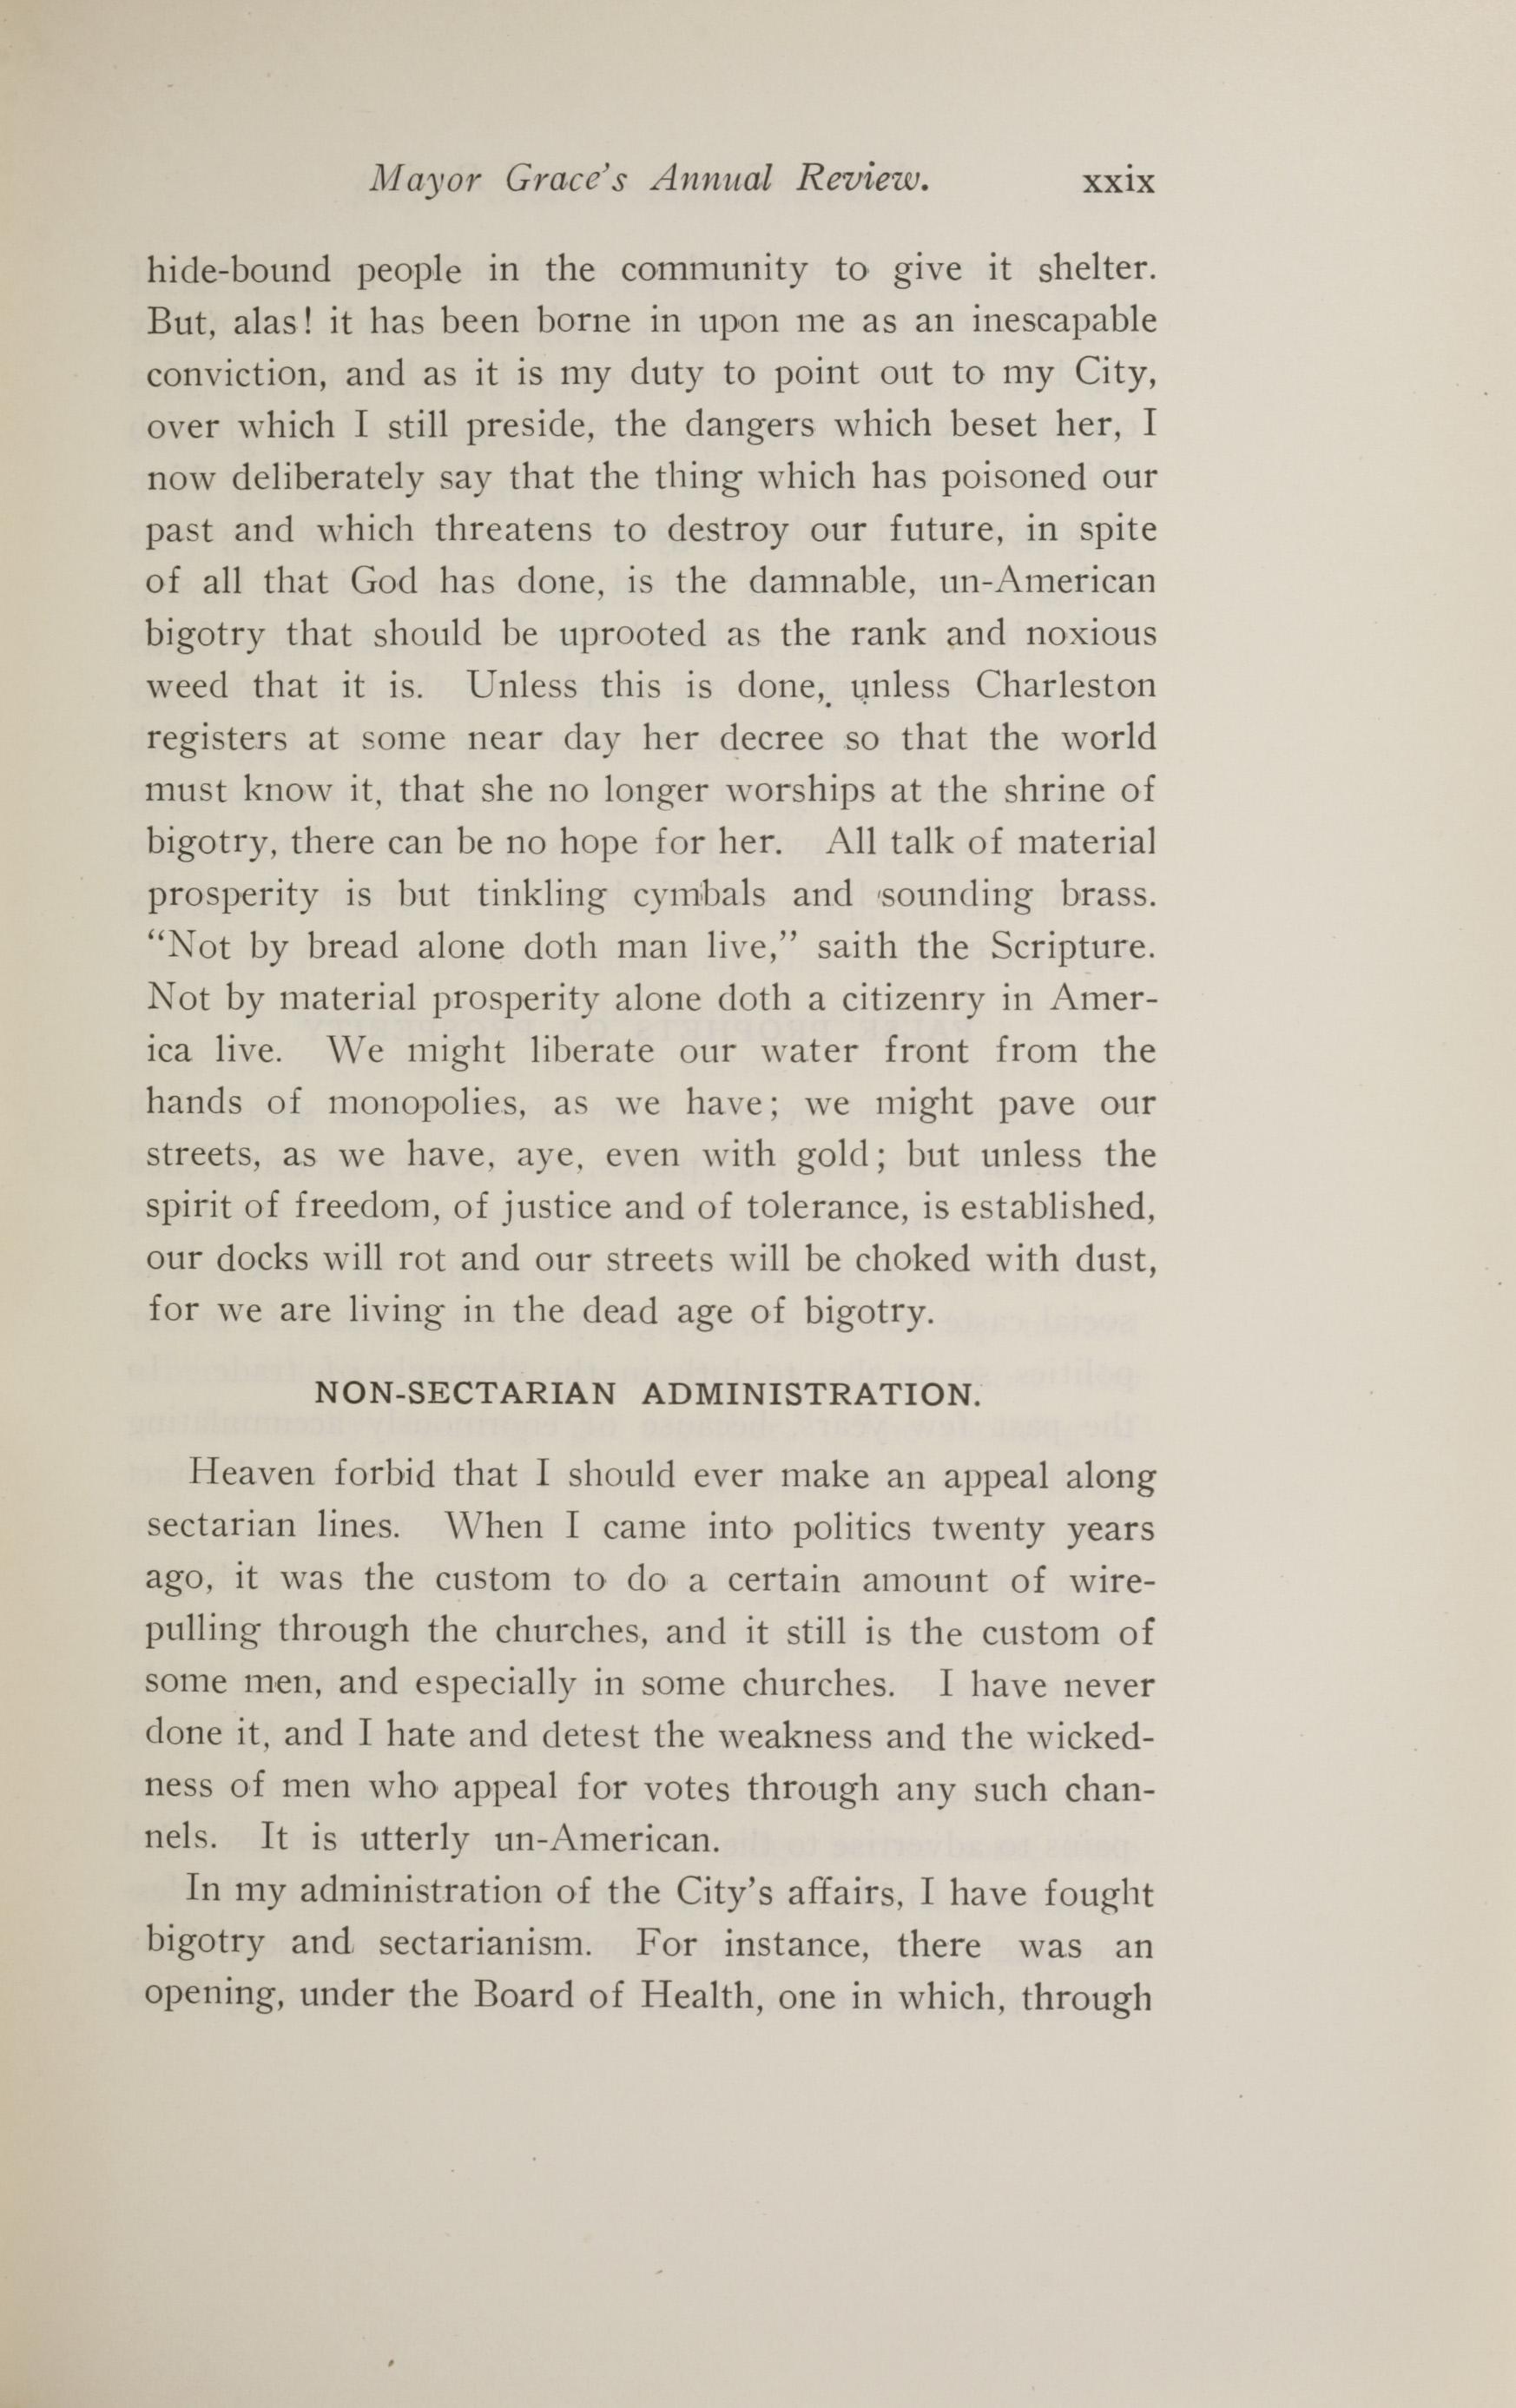 Charleston Yearbook, 1914, page xxix